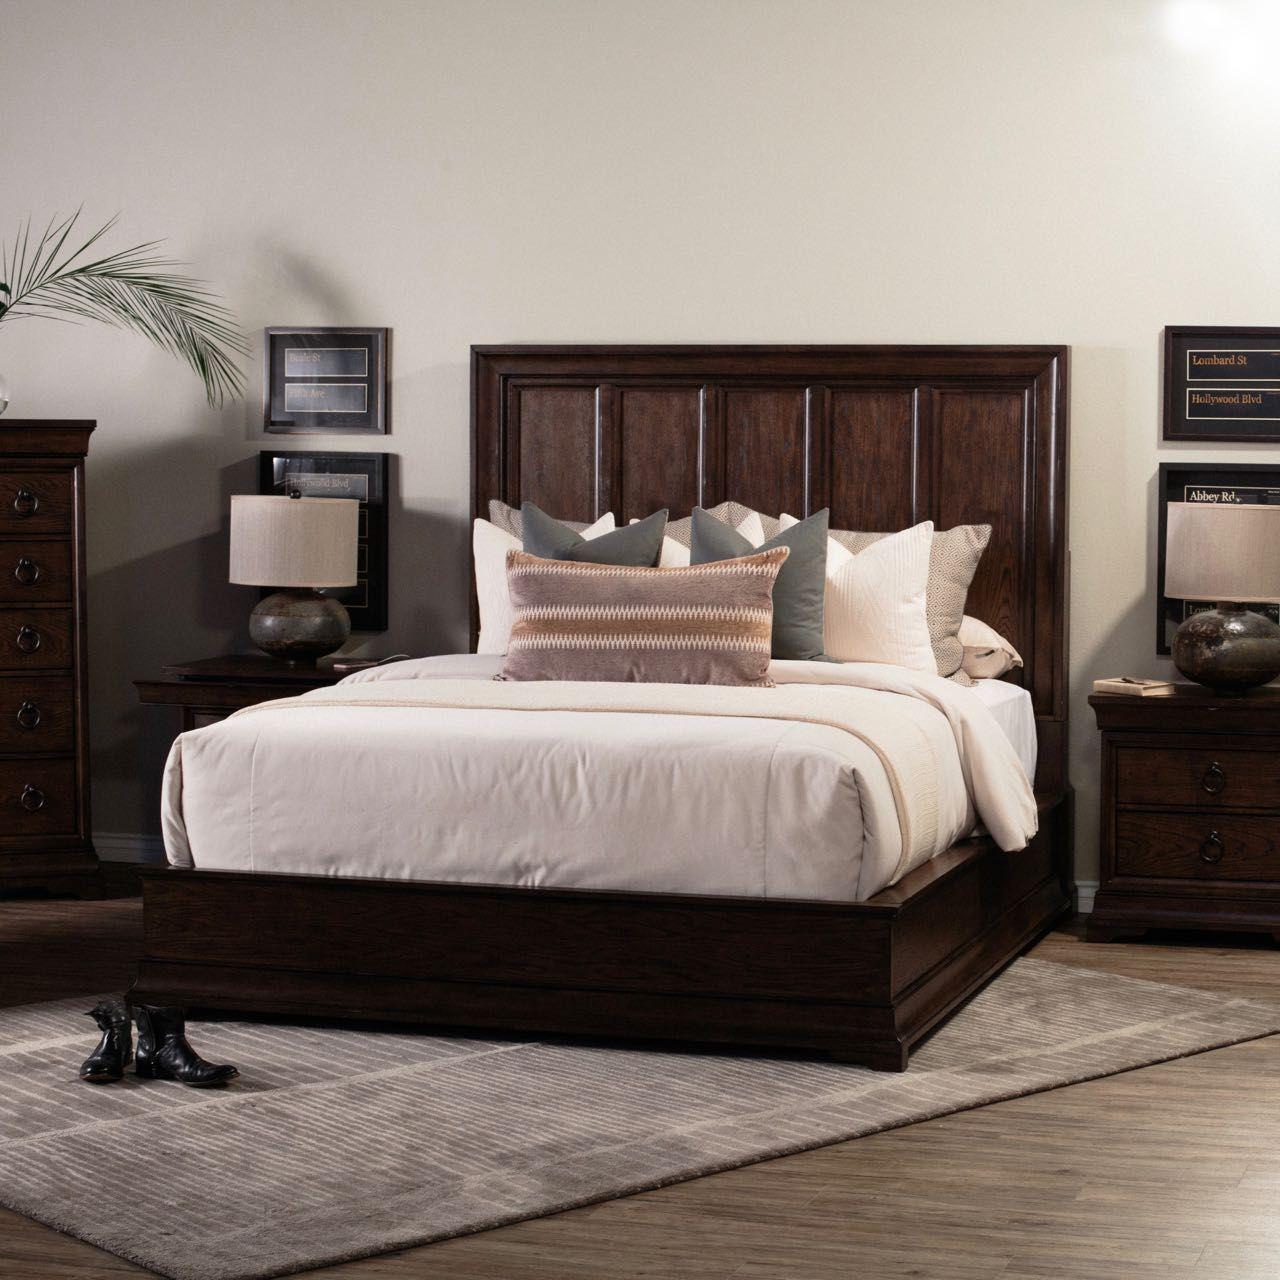 Lindale By Pulaski Brown Panel Bed Panel Bed Bed